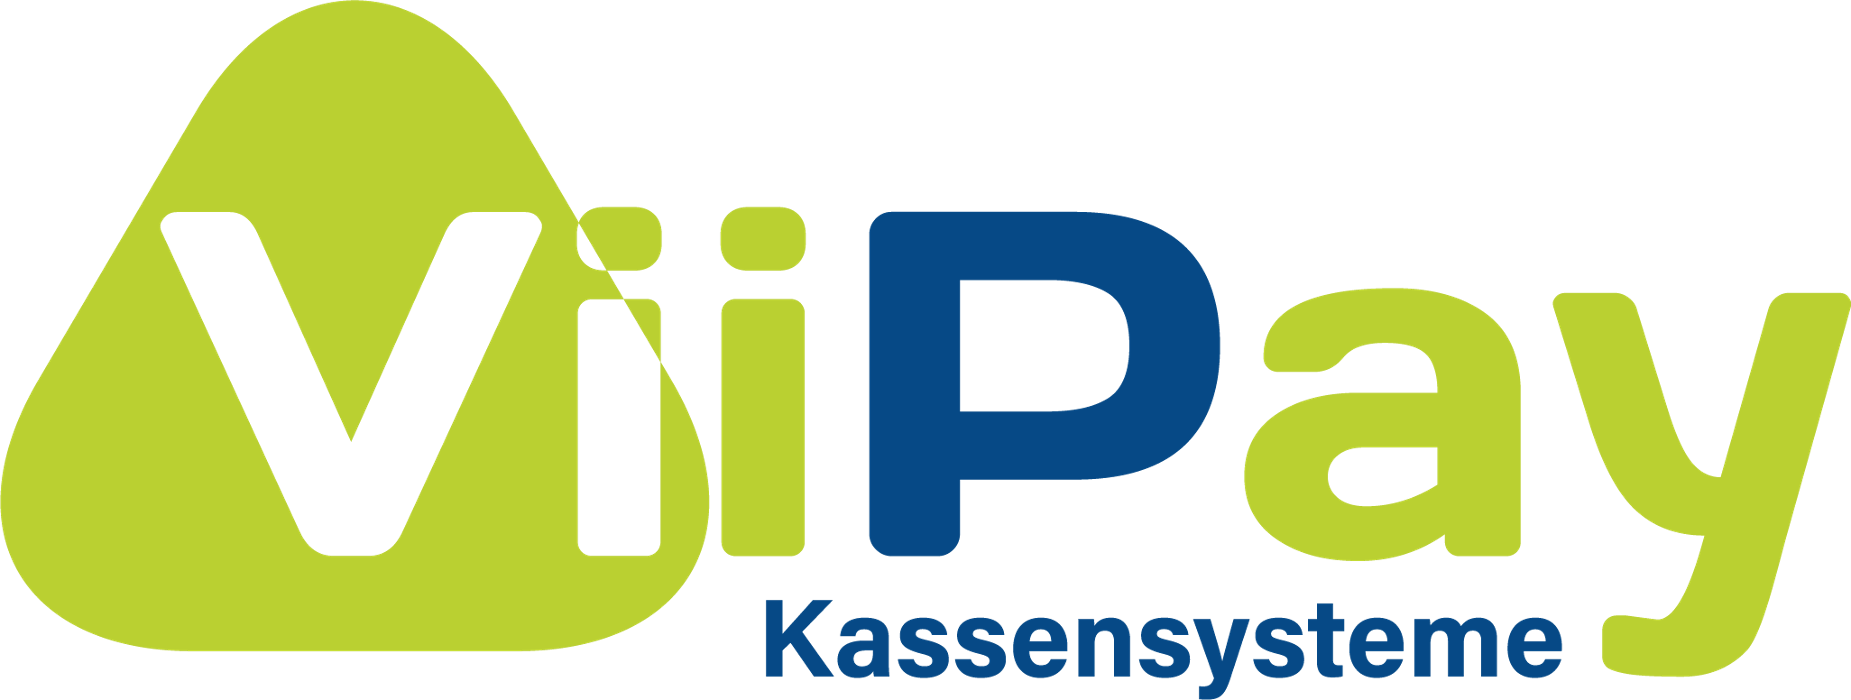 viiPAY Kassensysteme in Niederdorfelden